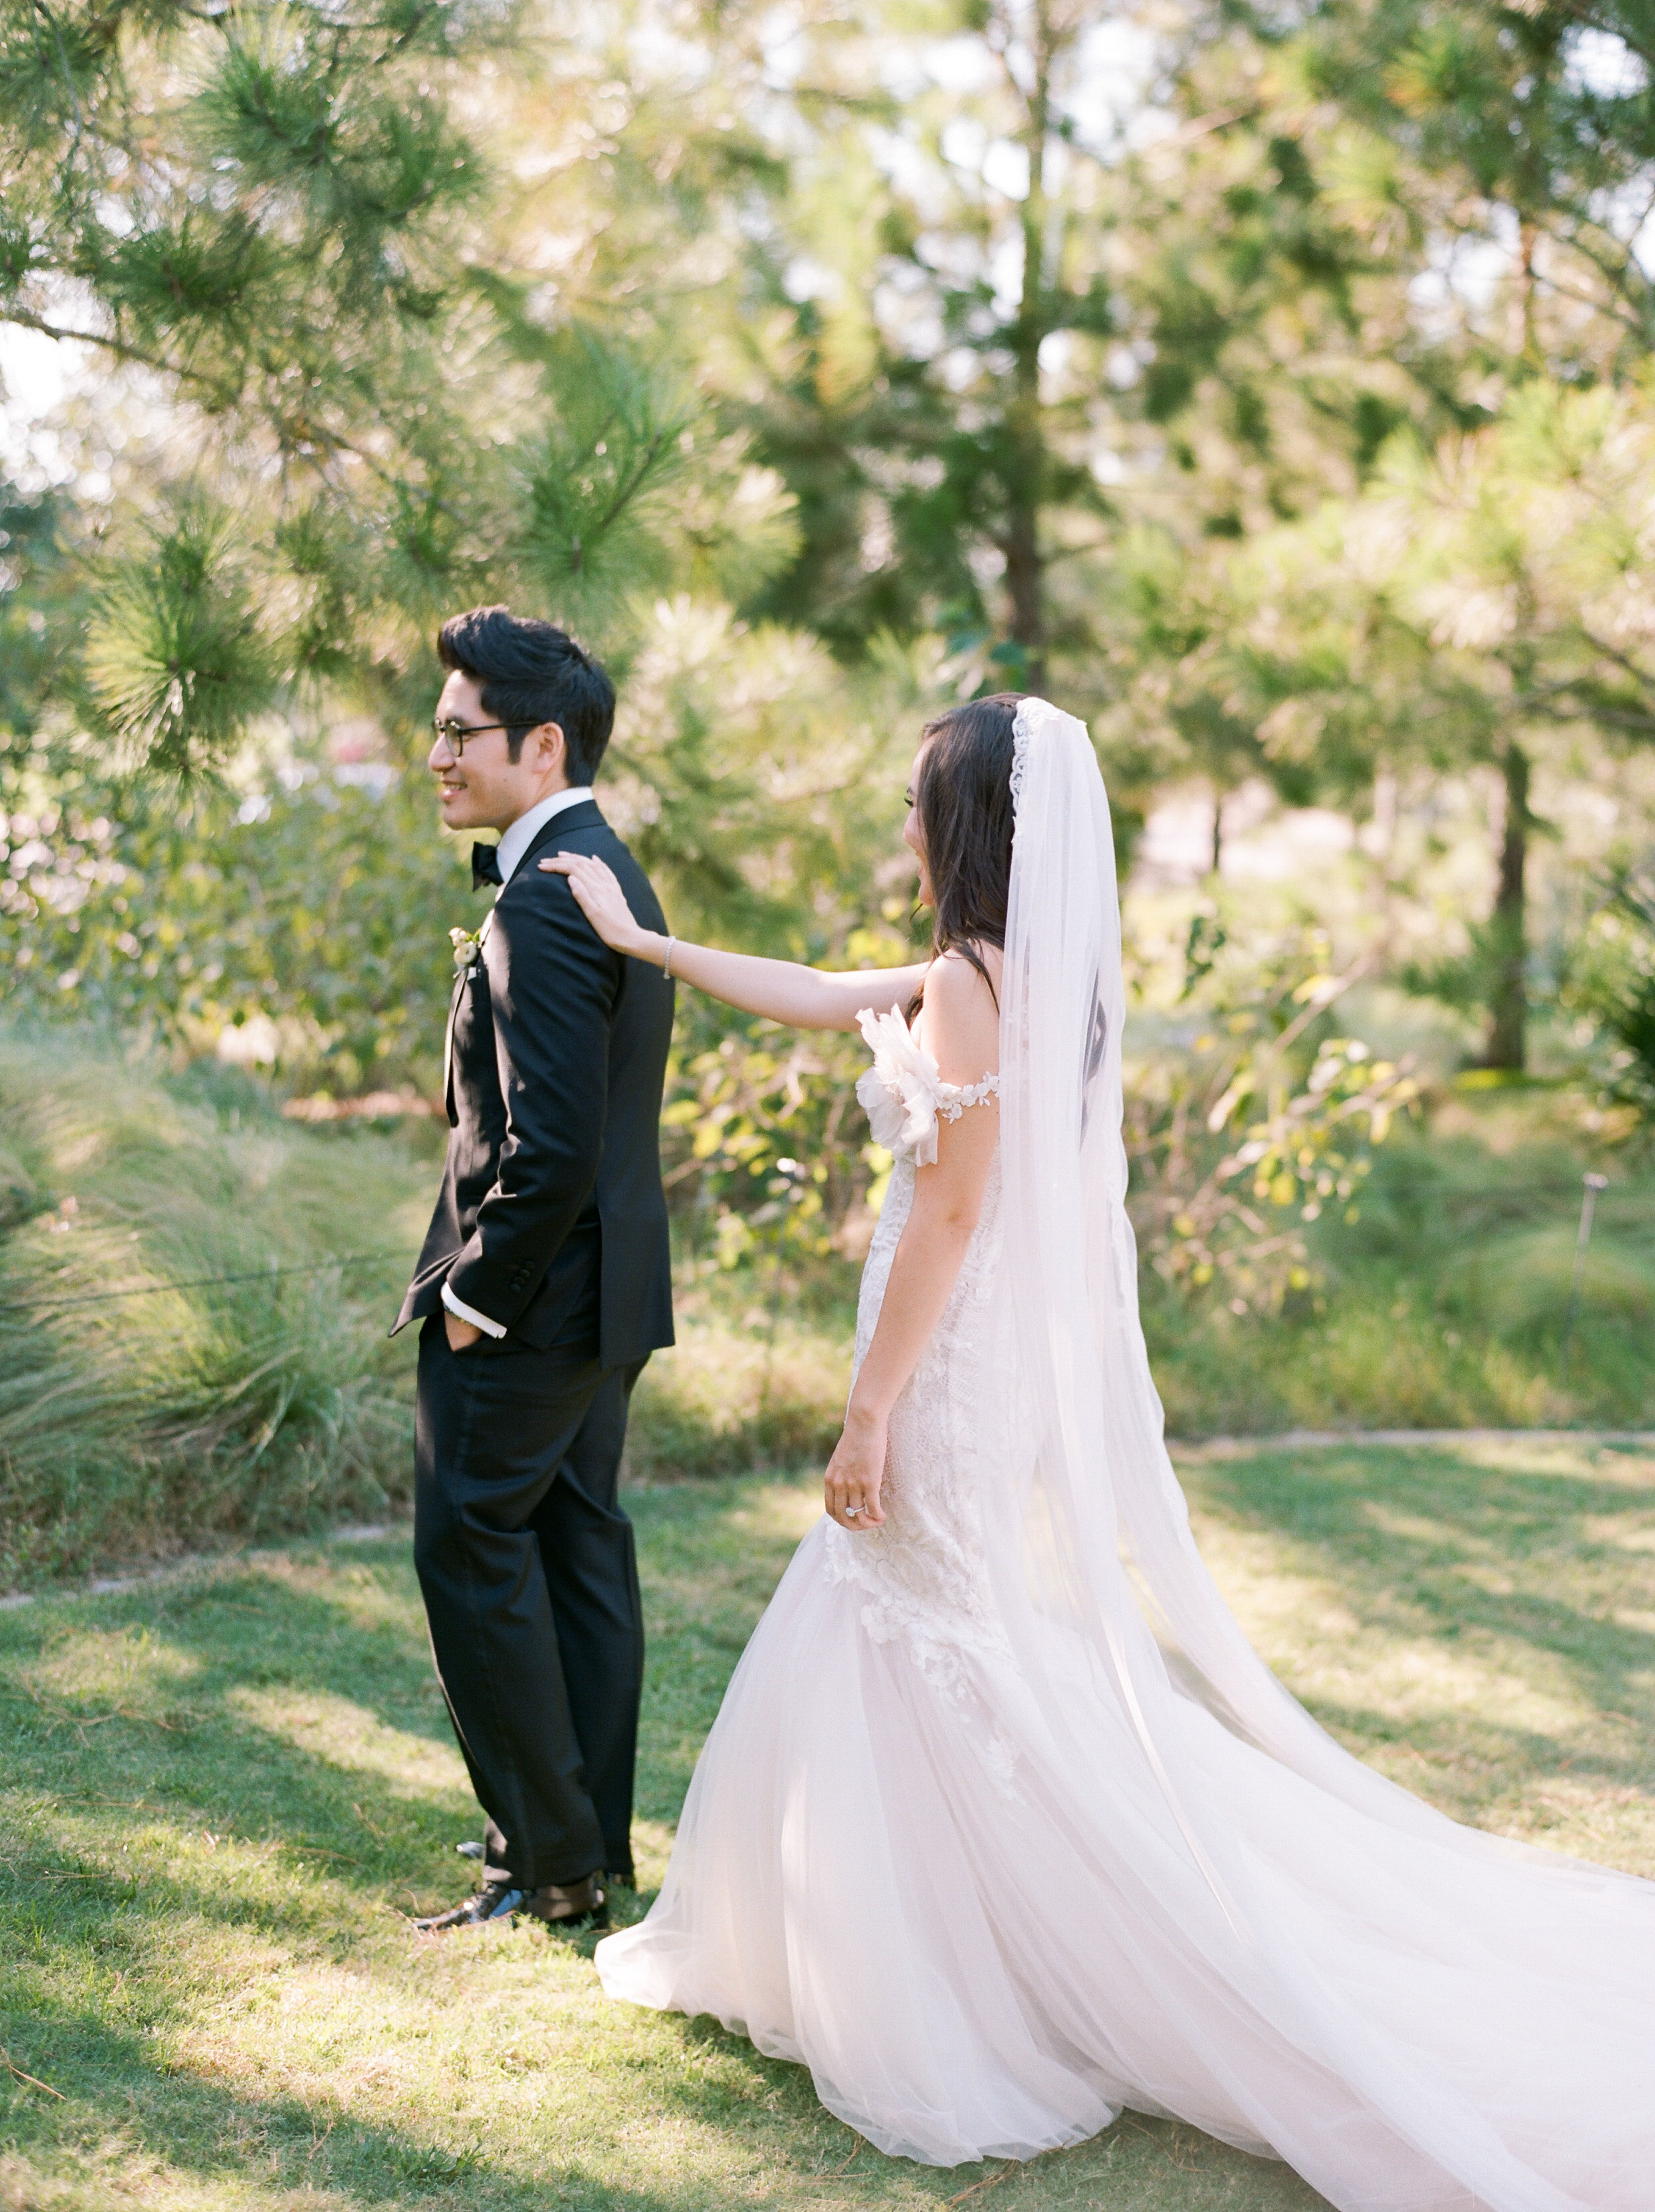 Martha-Stewart-Wedding-Dana-Fernandez-Photography-Josh-Texas-Film-Houston-Wedding-Fine-Art-Photographer-McGovern-Centennial-Gardens-Top-Best-13.jpg